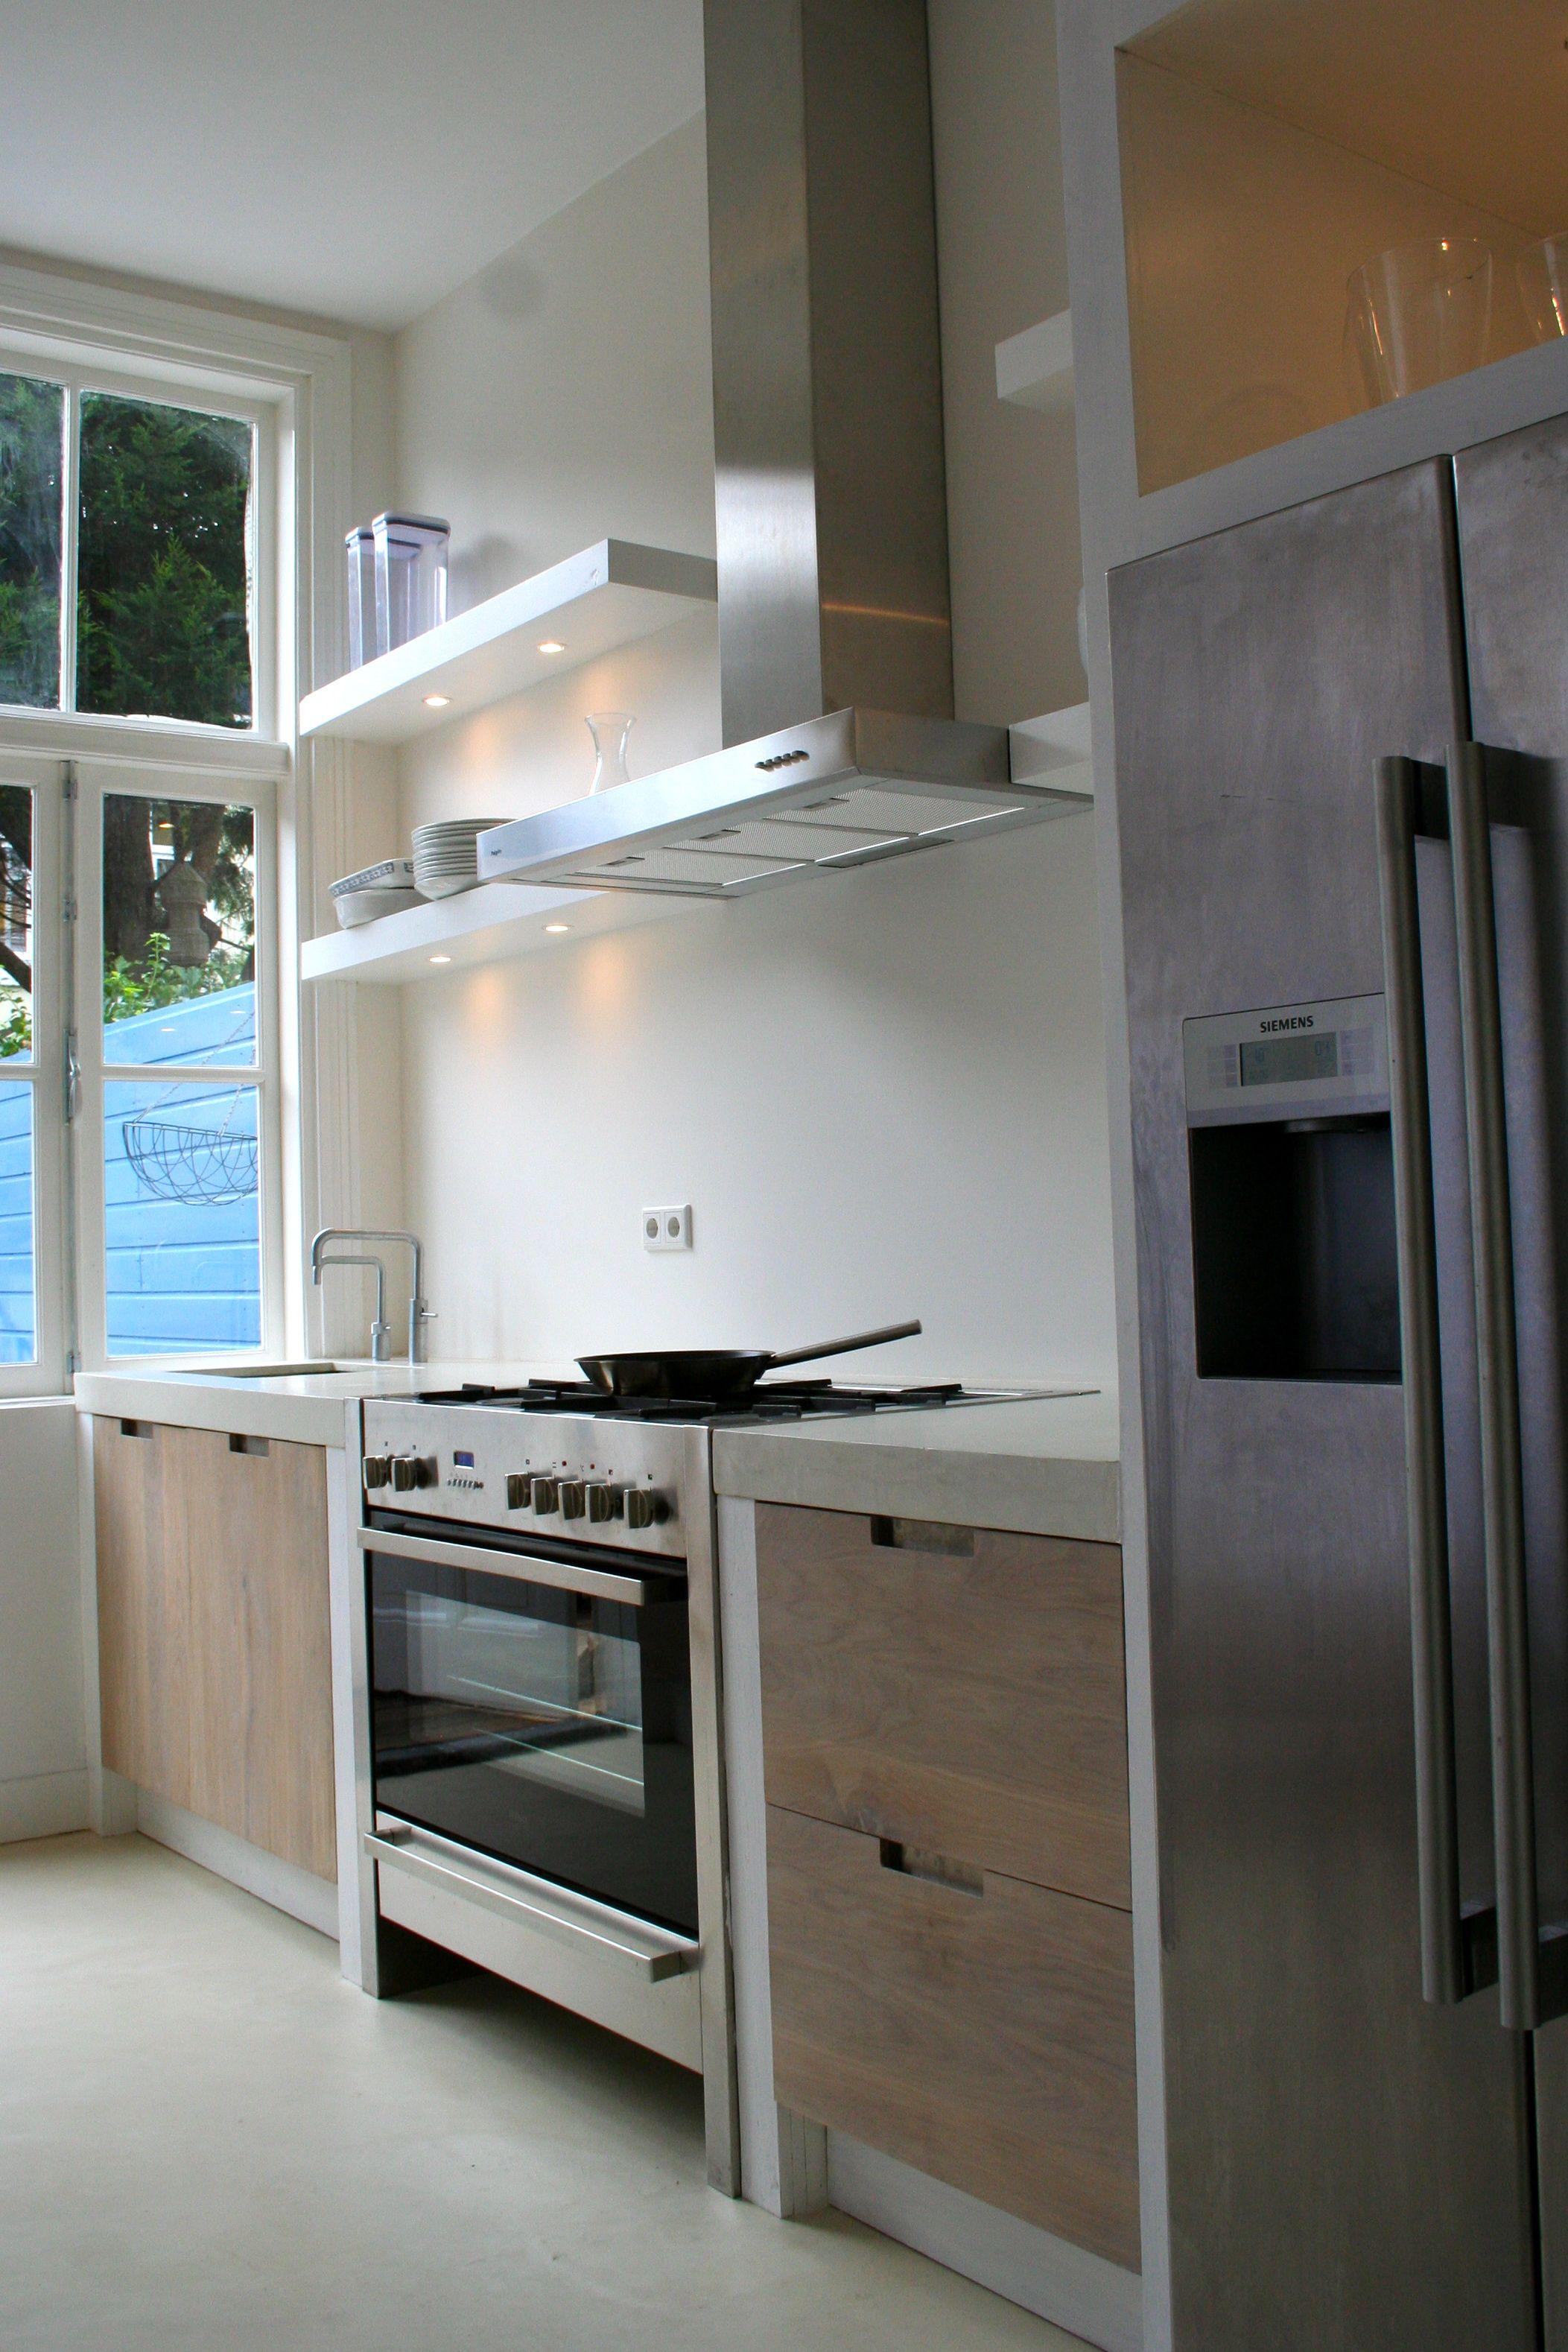 amazing whitewash eiken houten keuken ikea koak design whitewash eiken houten keuken op ikea. Black Bedroom Furniture Sets. Home Design Ideas